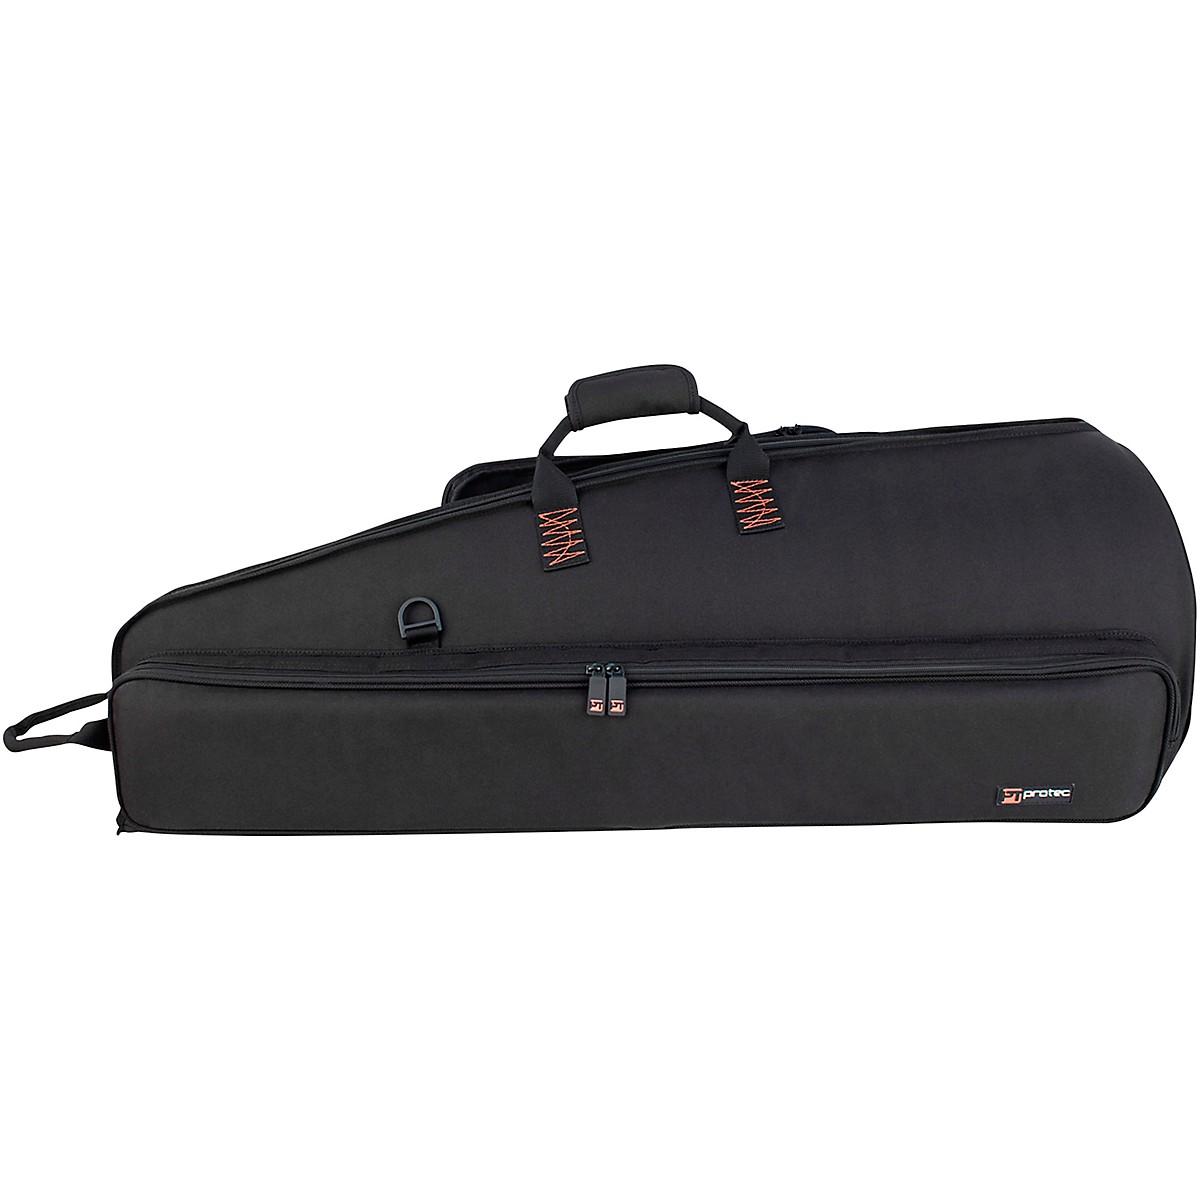 Protec Bass Trombone Gig Bag, Explorer Series (C245X)